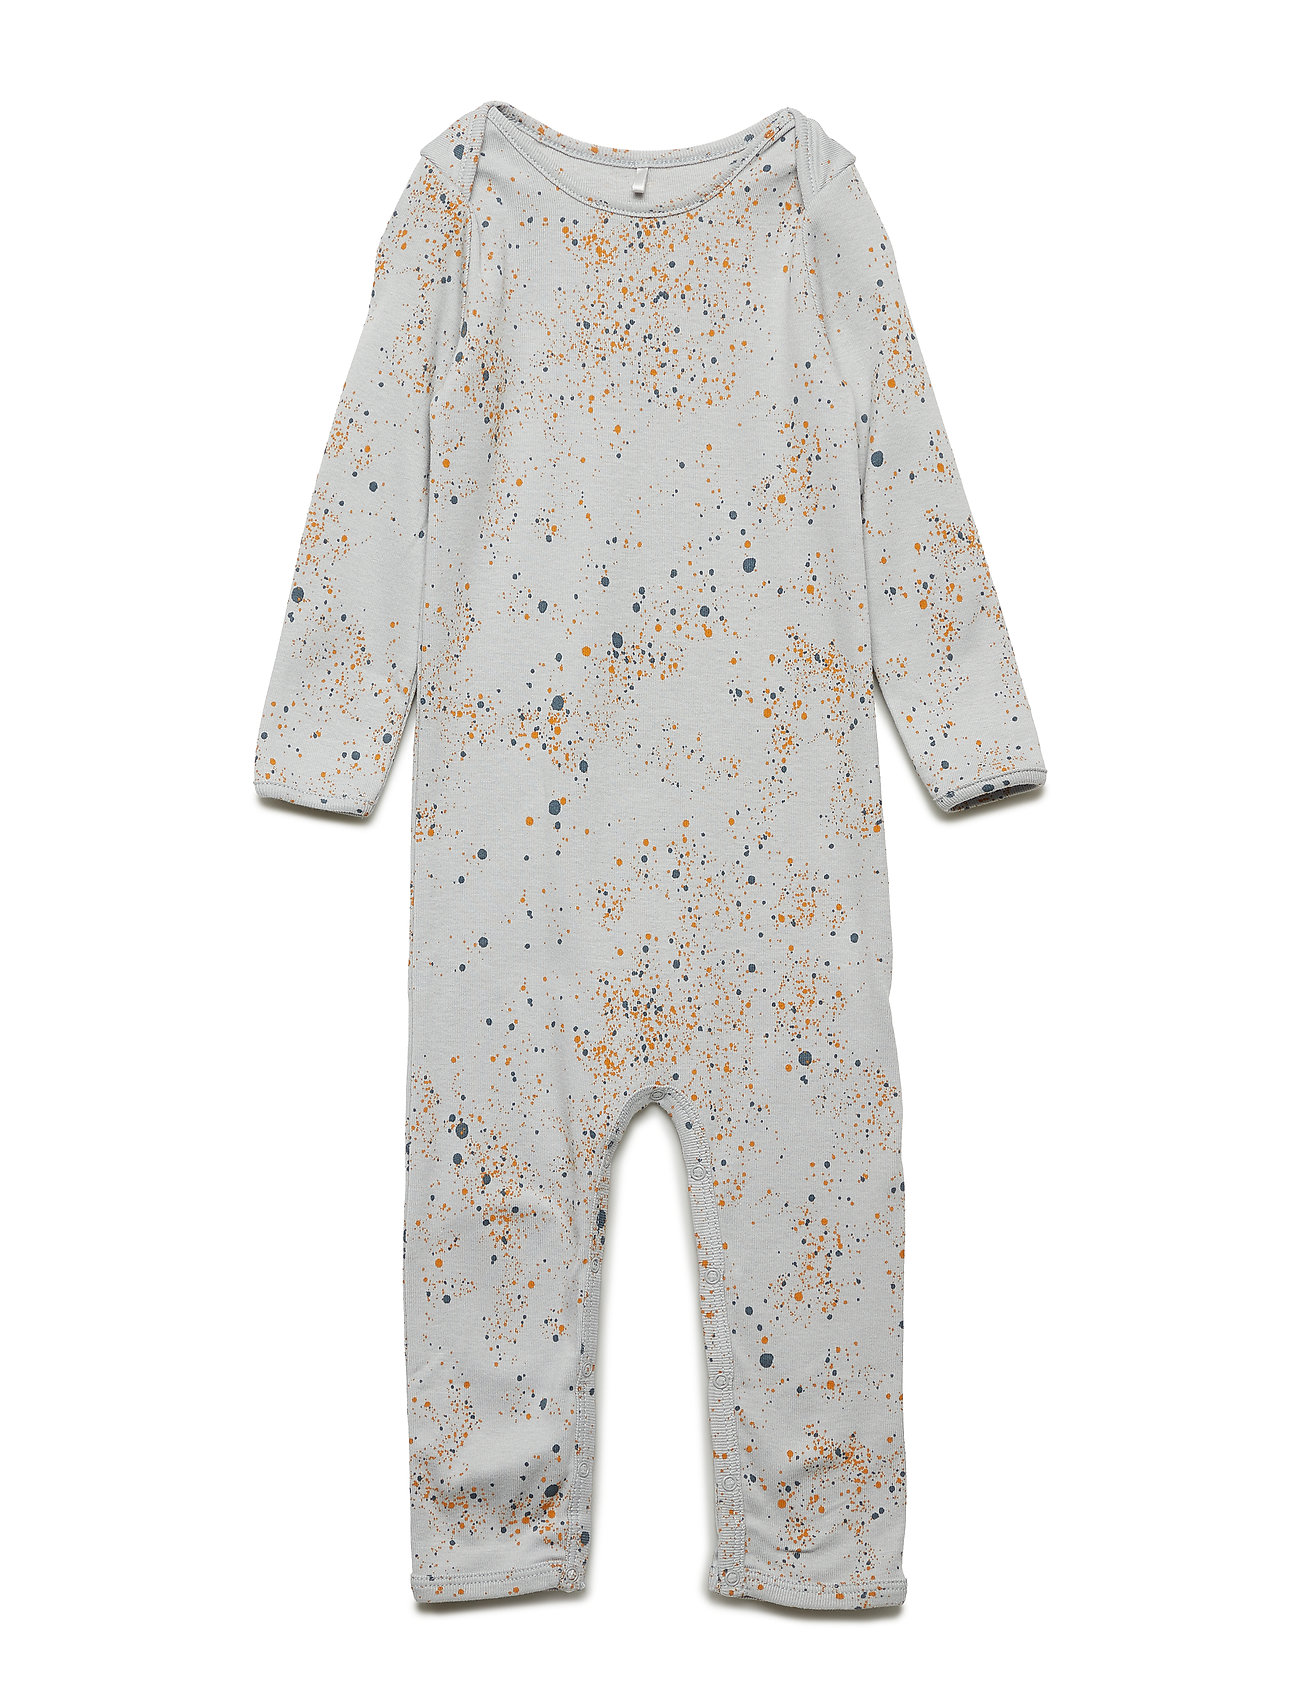 Soft Gallery Ben Bodysuit - OCEAN GREY, AOP MINI SPLASH BLUE